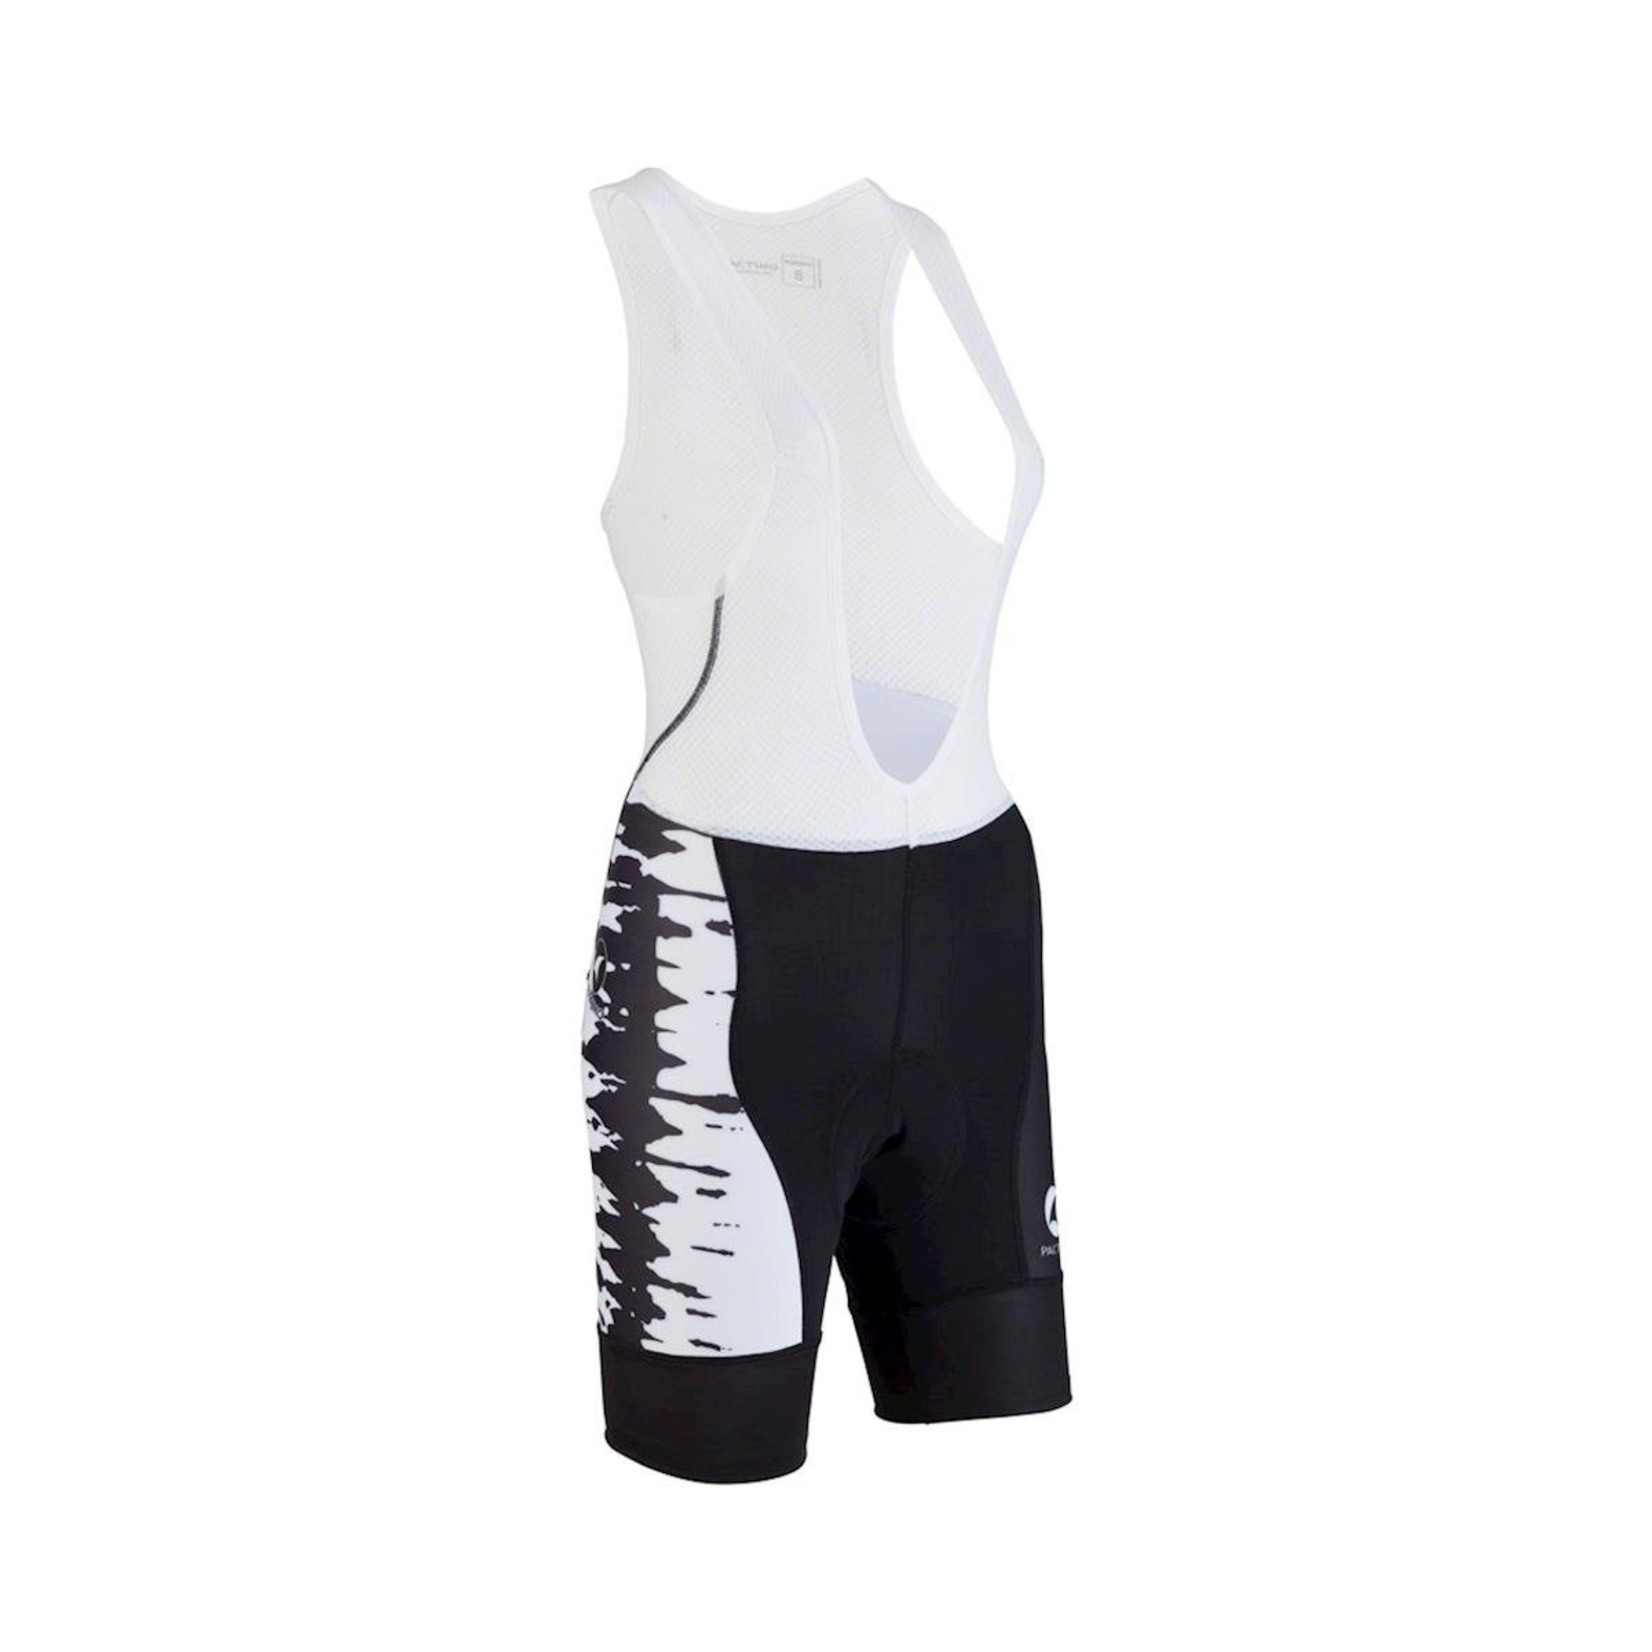 All-City Wangaaa! Women's Bib Short: Black/White XL